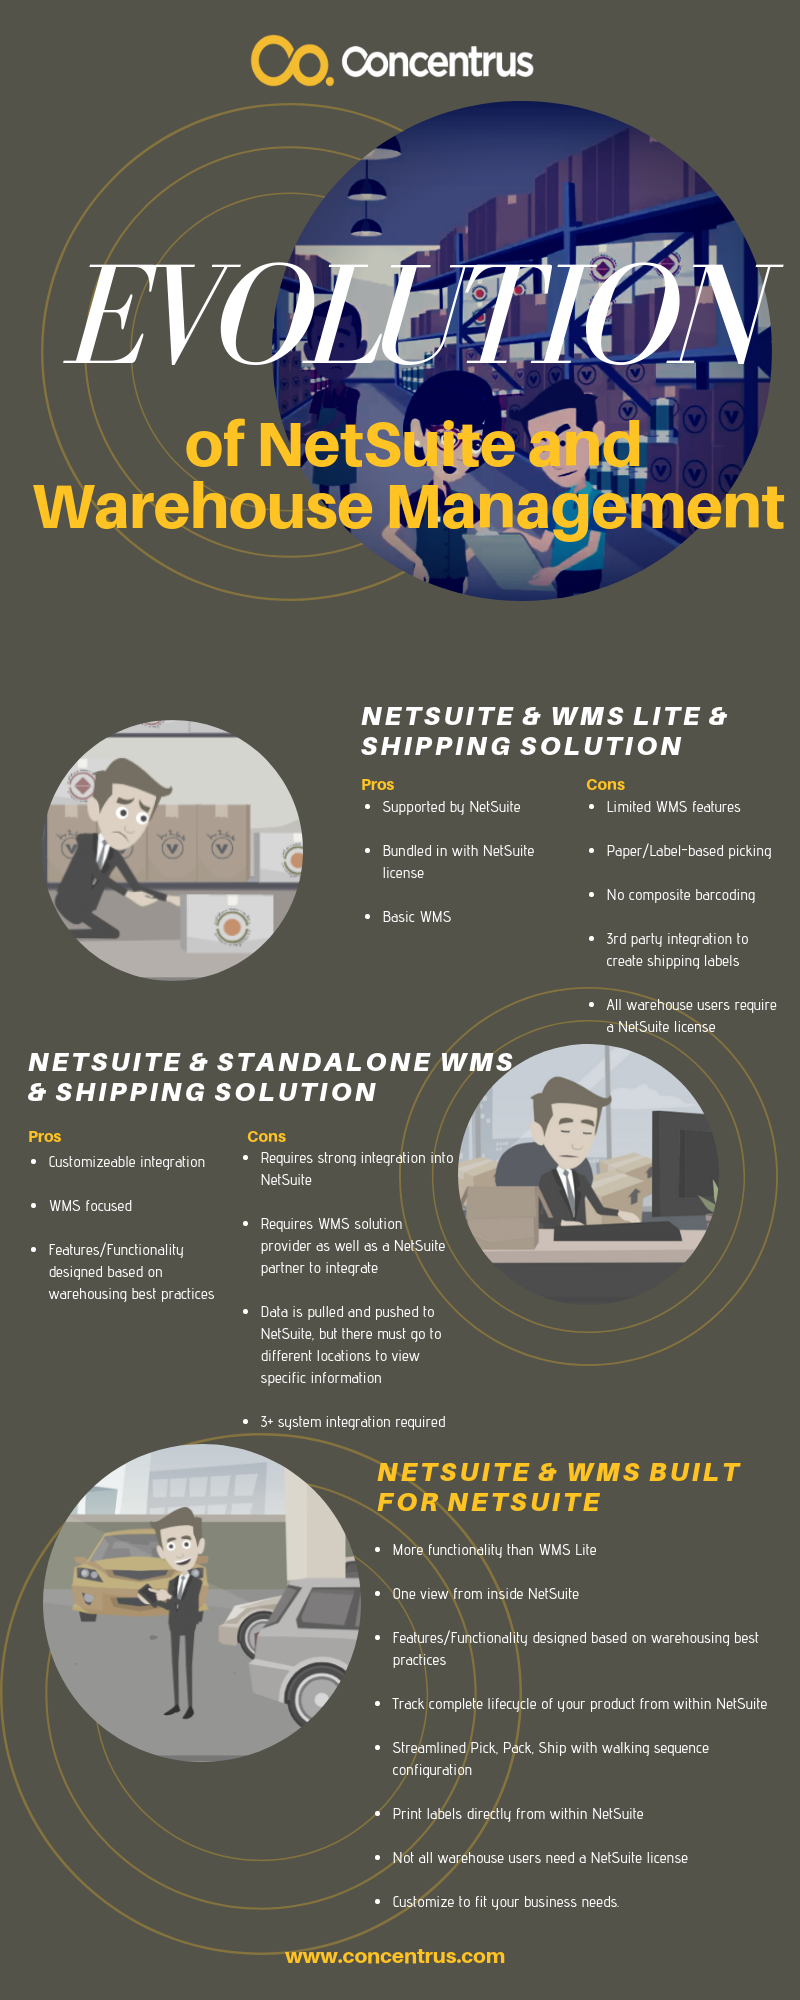 Evolution of NetSuite & Warehouse Management (1)